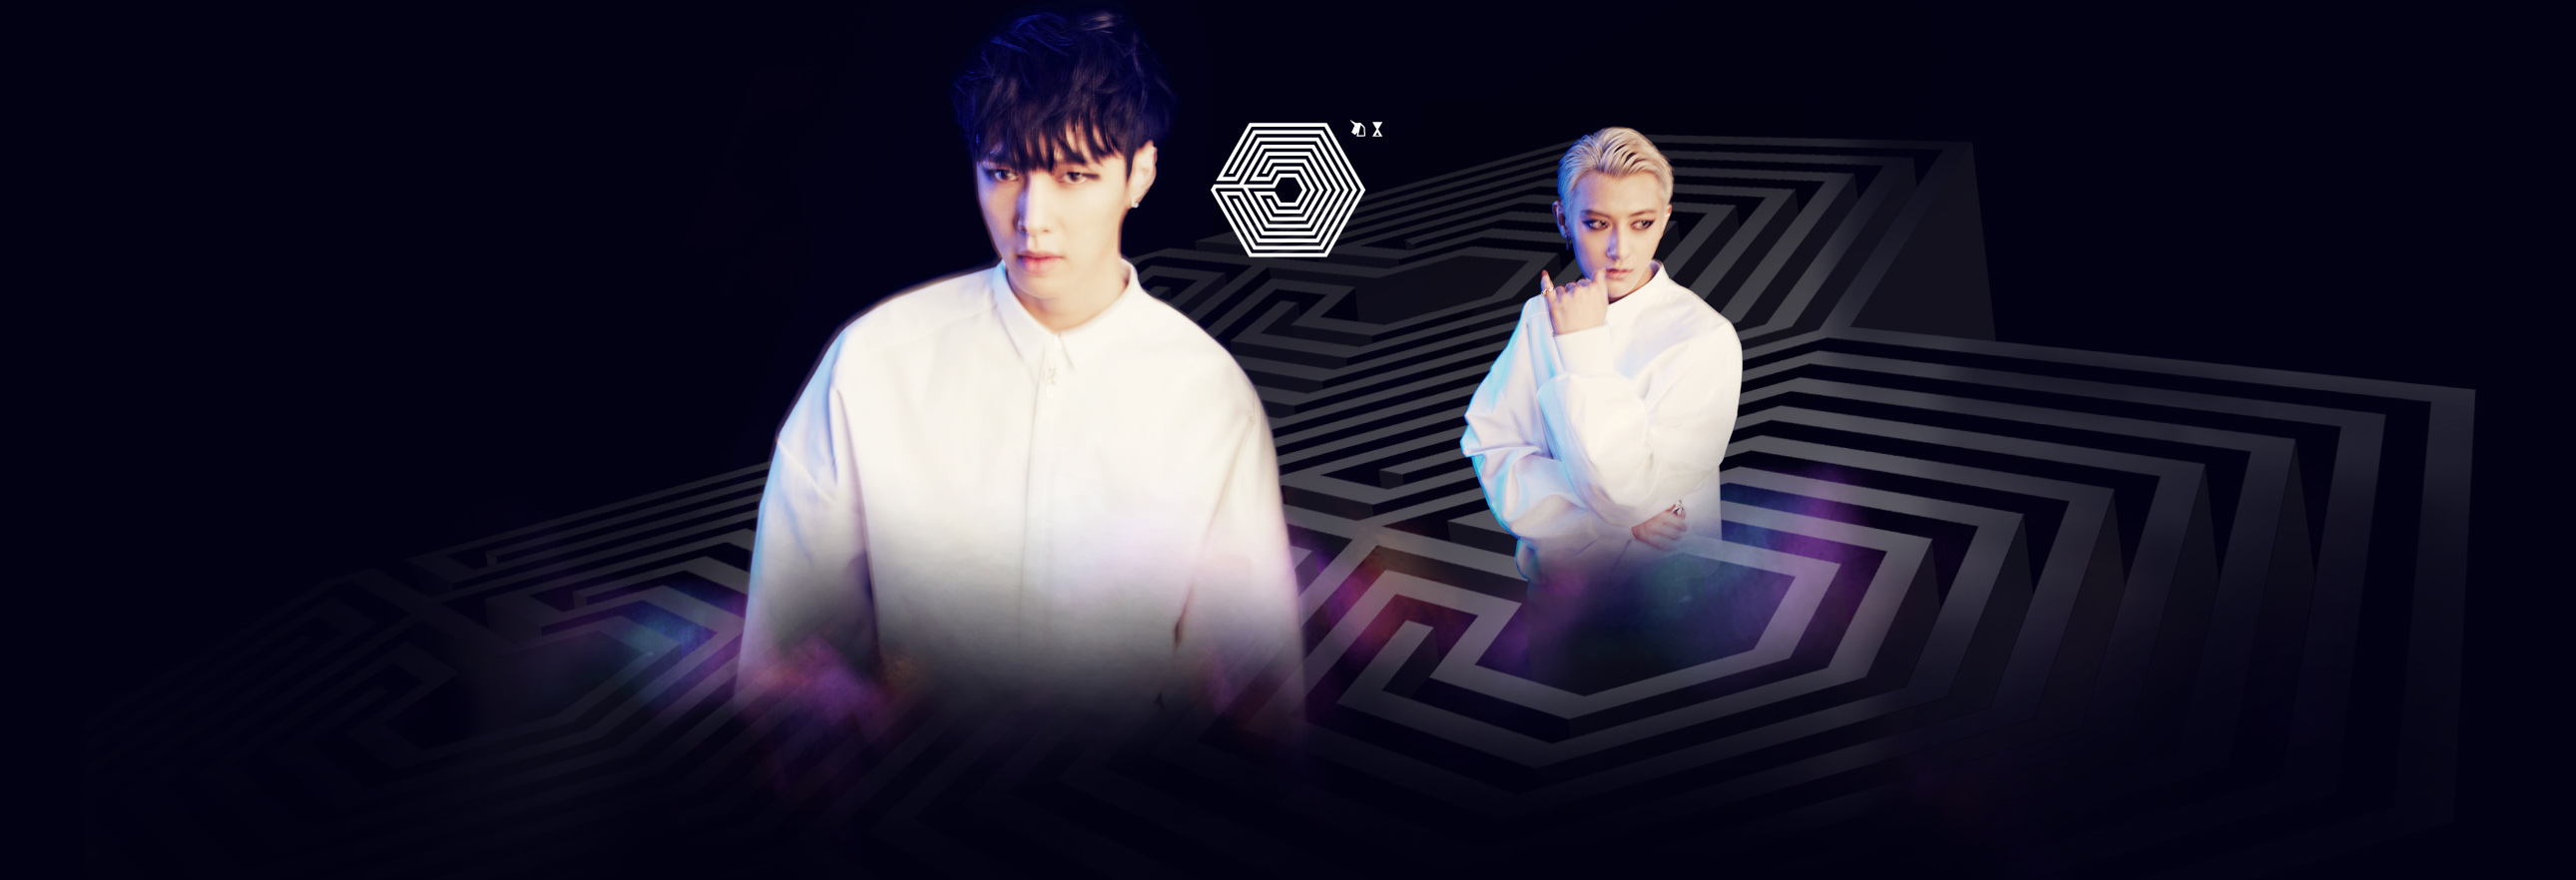 Exo Official Website